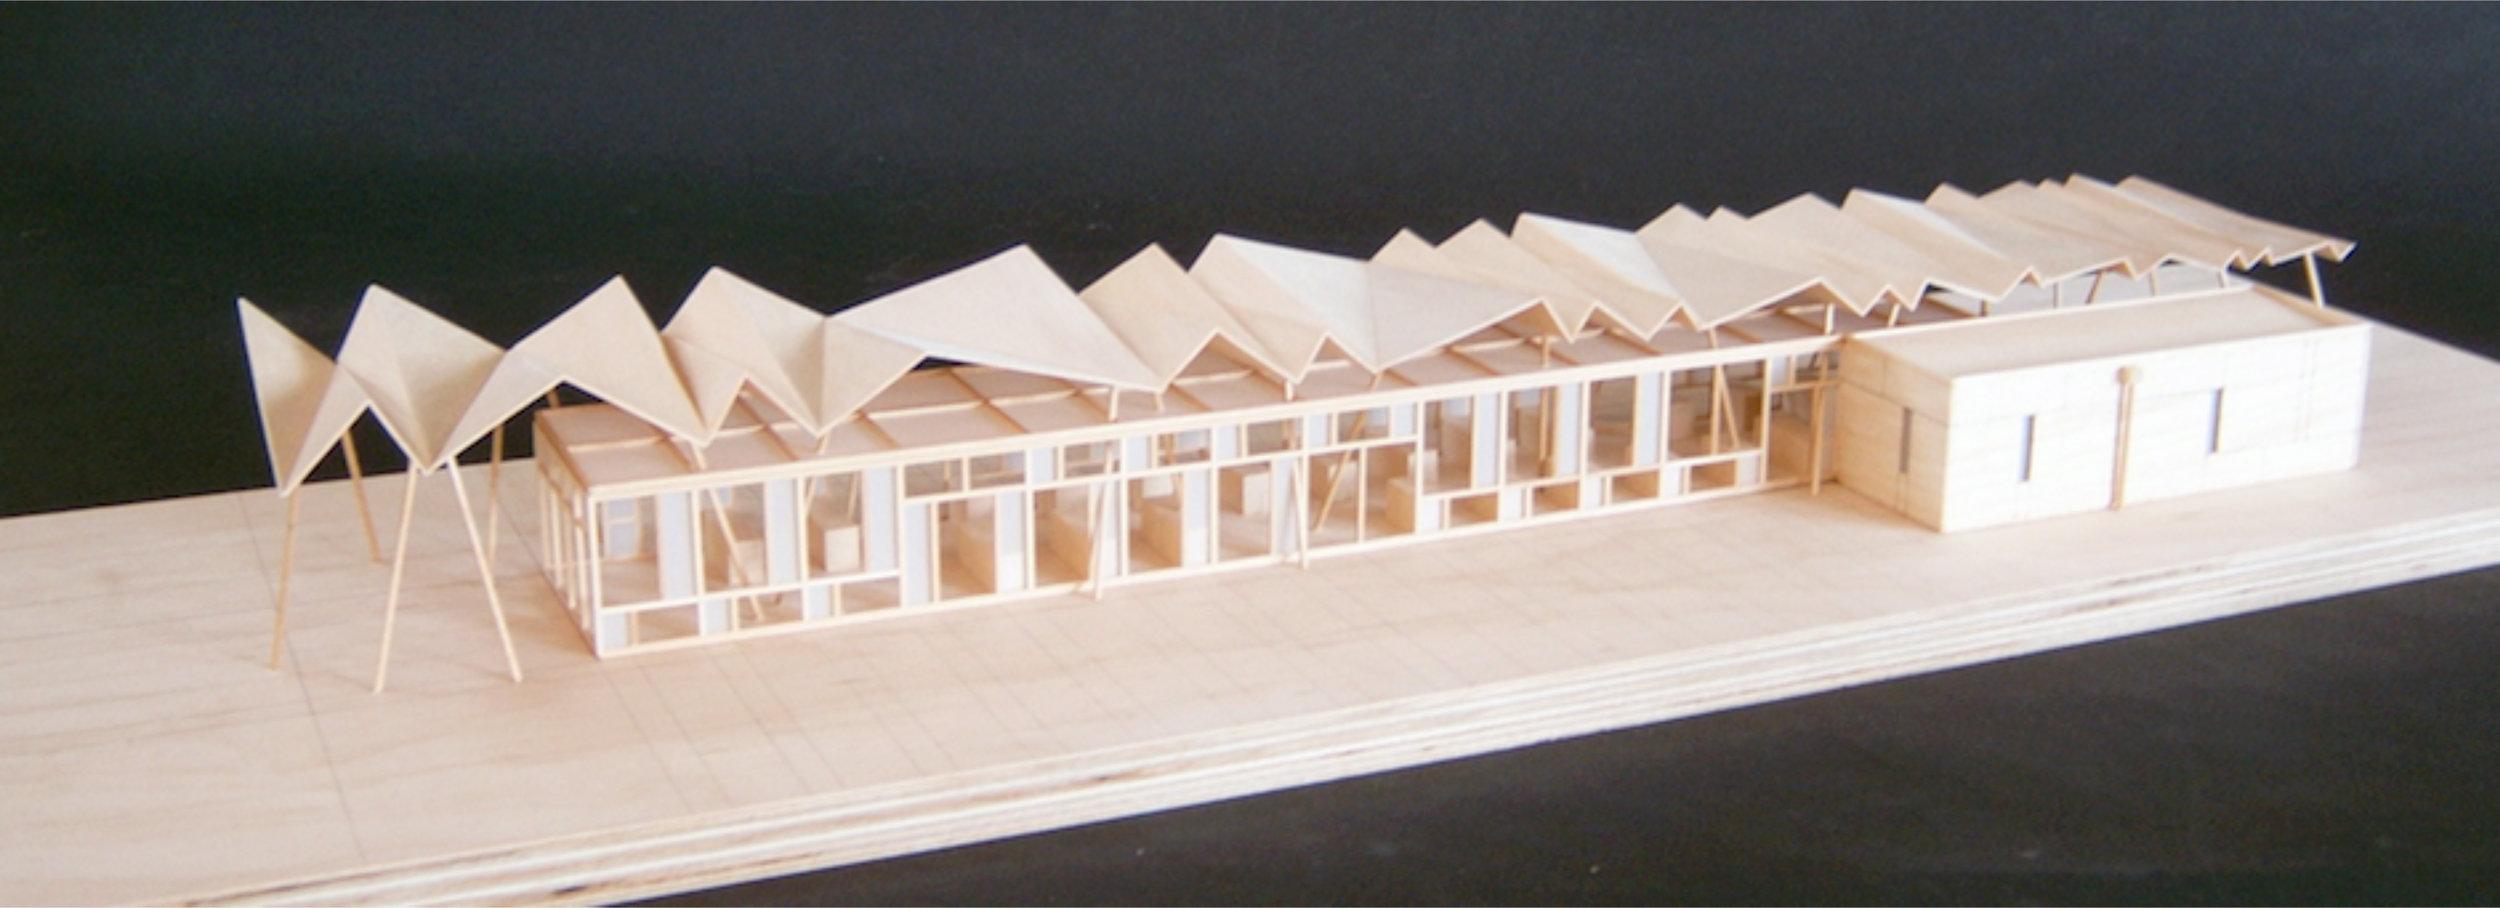 Harbor Islands Pavilion 3.jpg